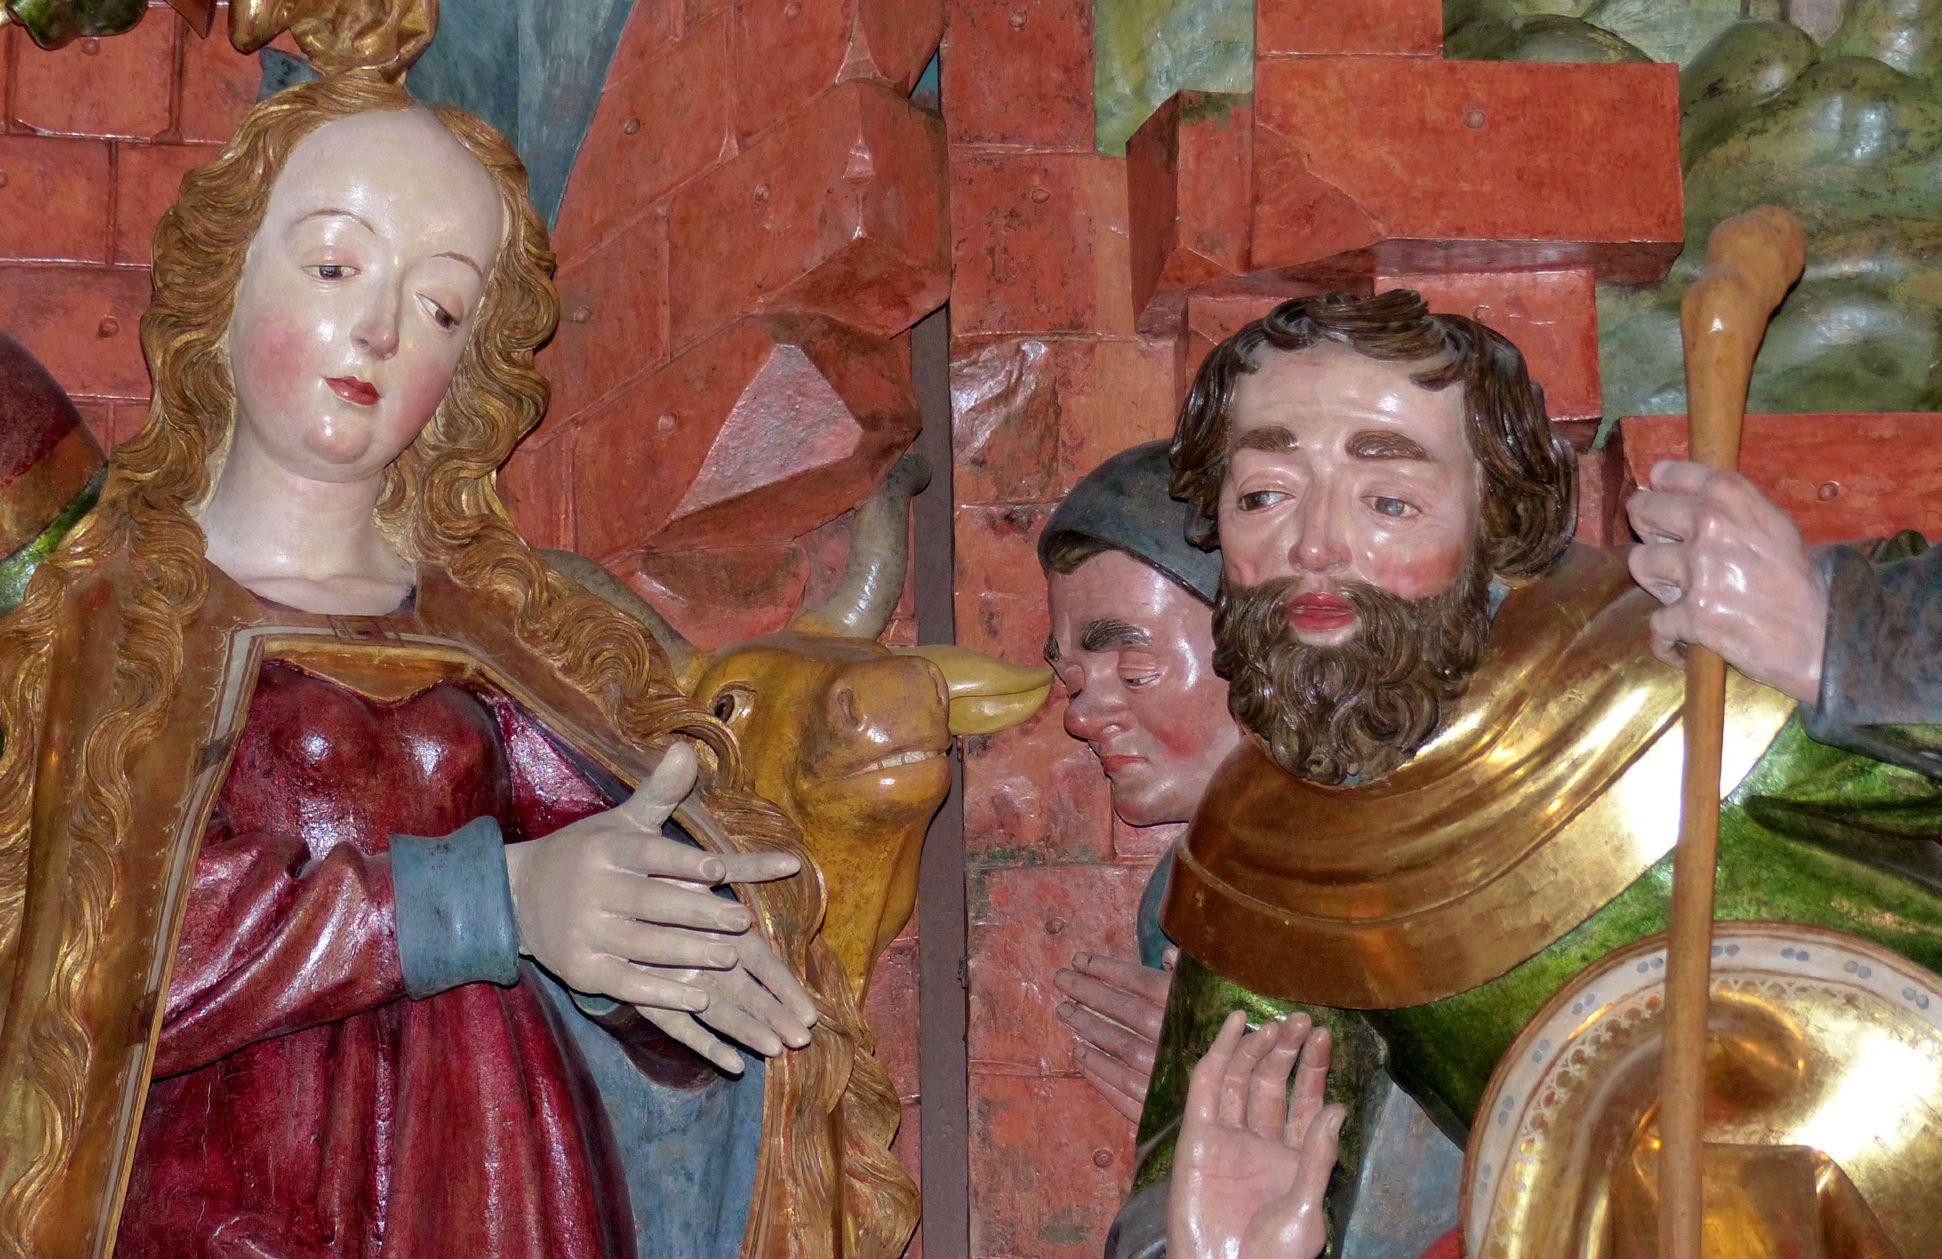 Altar of Mary (Salzburg) Central shrine, Mary and shepherds